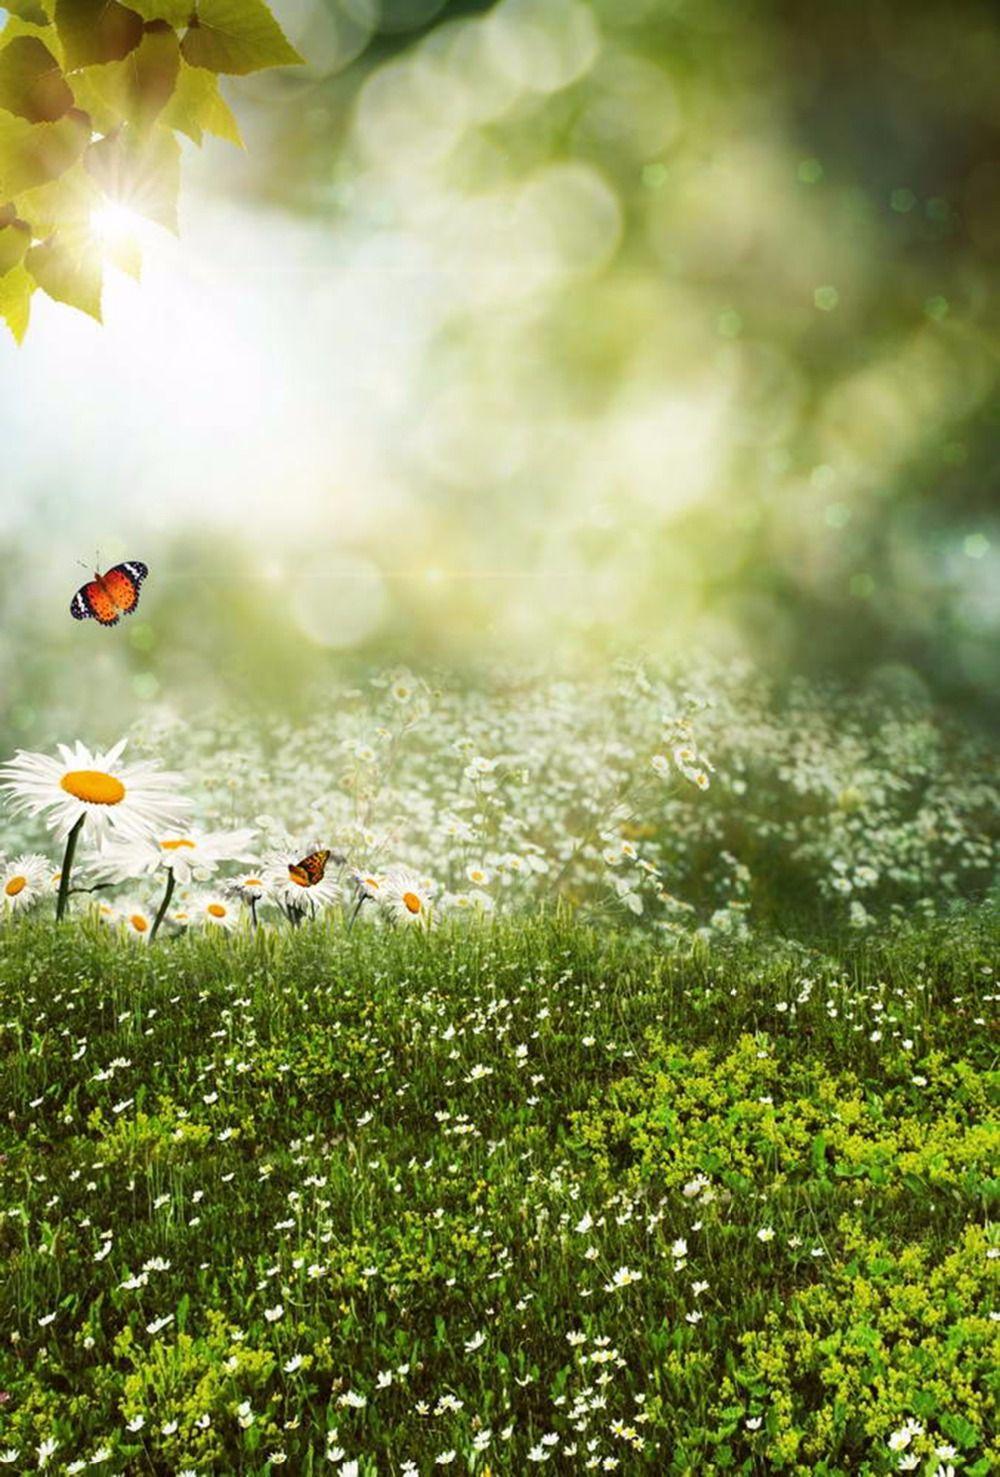 2019 Kids Spring Photos Backgrounds White Flowers Green Grass Sunshine Sparkle Polka Dots Bokeh Photography Backdrops Vinyl Scenic Wallpaper From